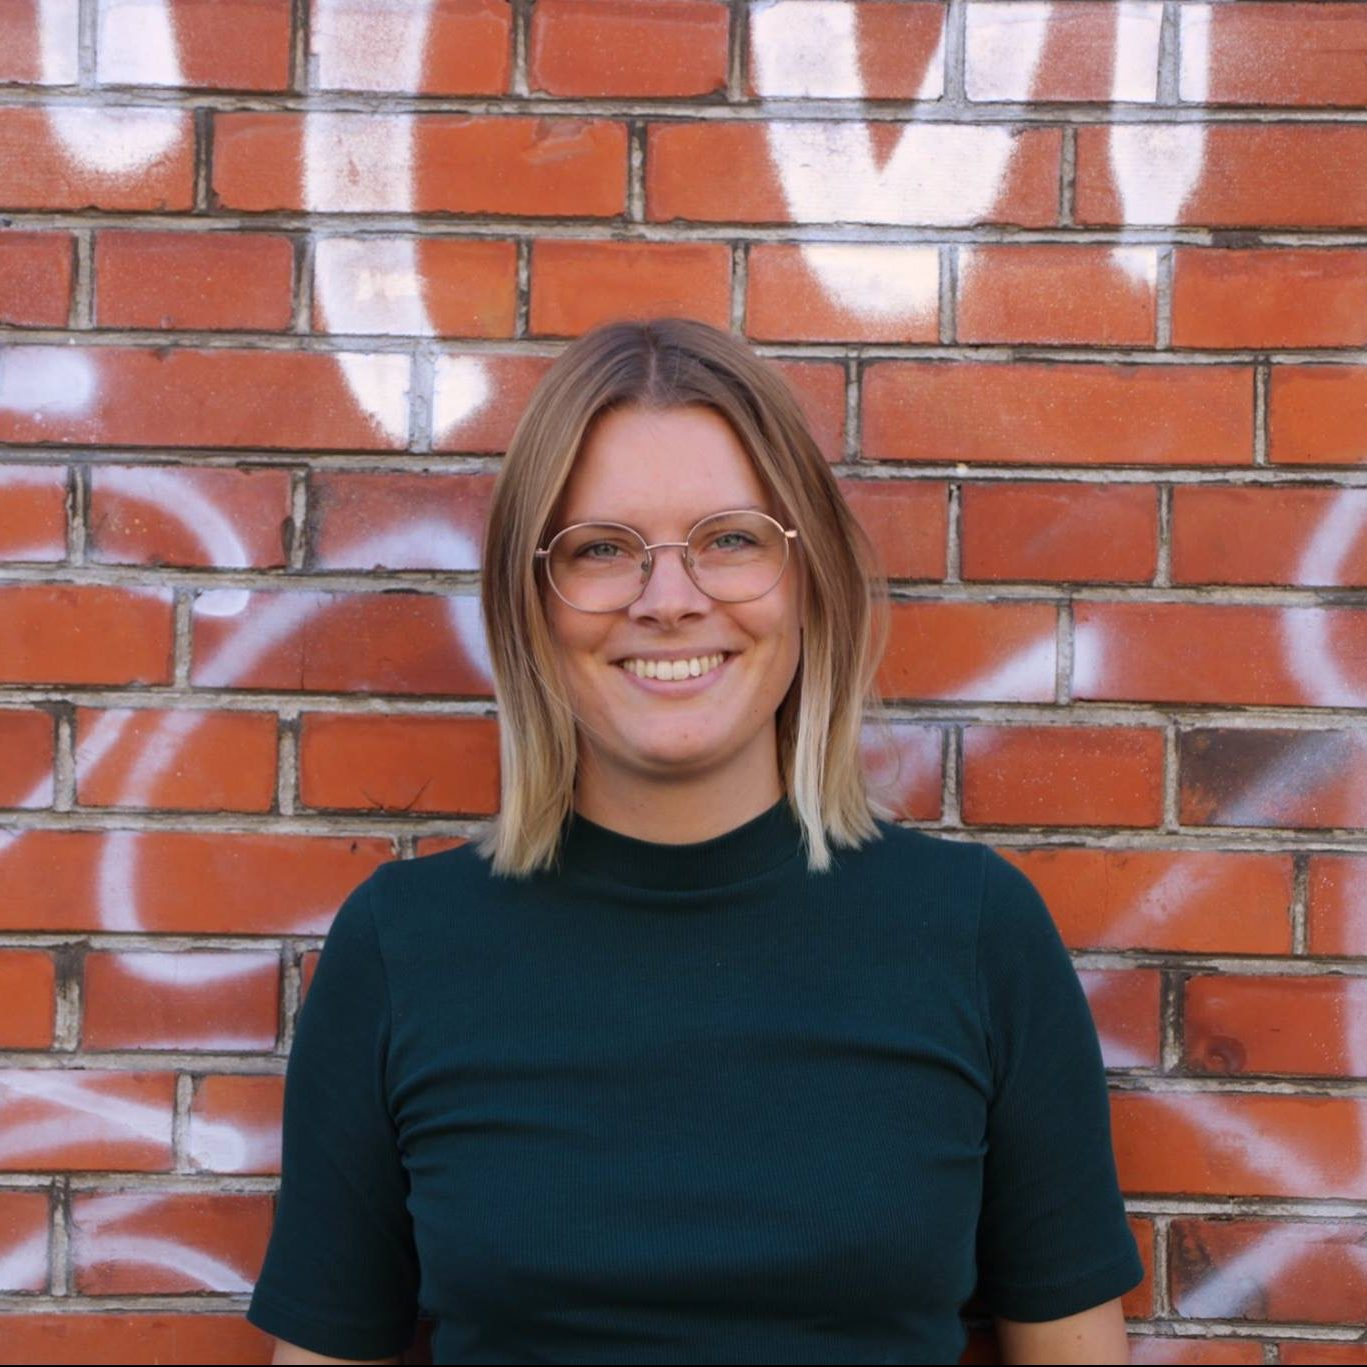 Susan Vendelbo Caspersen